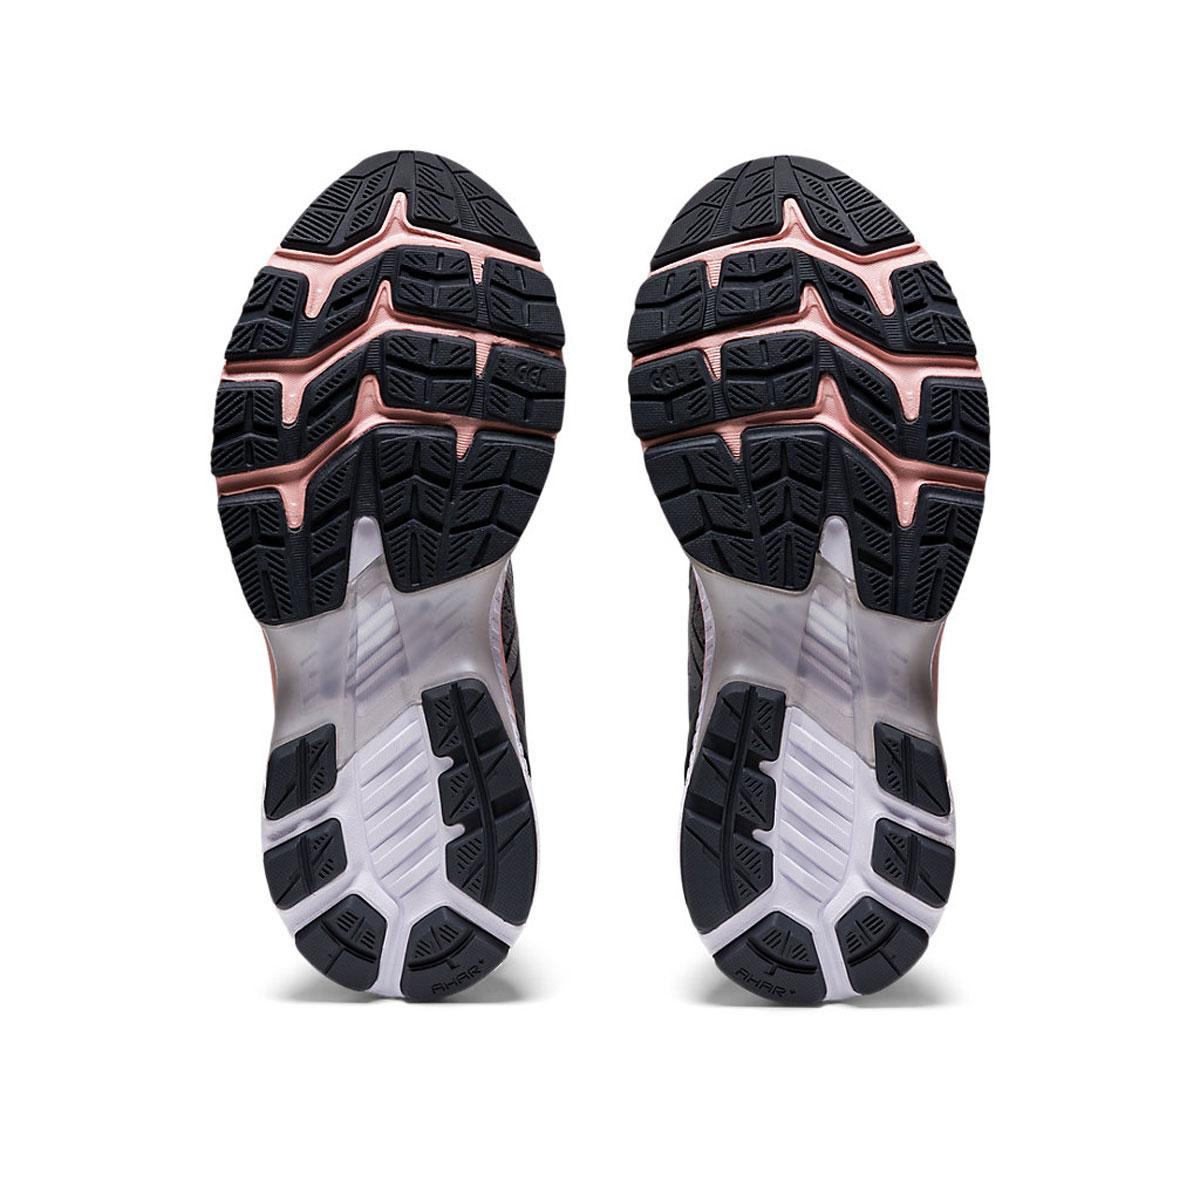 Women's Asics GEL-Kayano 27 Running Shoe - Color: Sheet Rock/Pure (Regular Width) - Size: 5, Sheet Rock/Pure, large, image 7